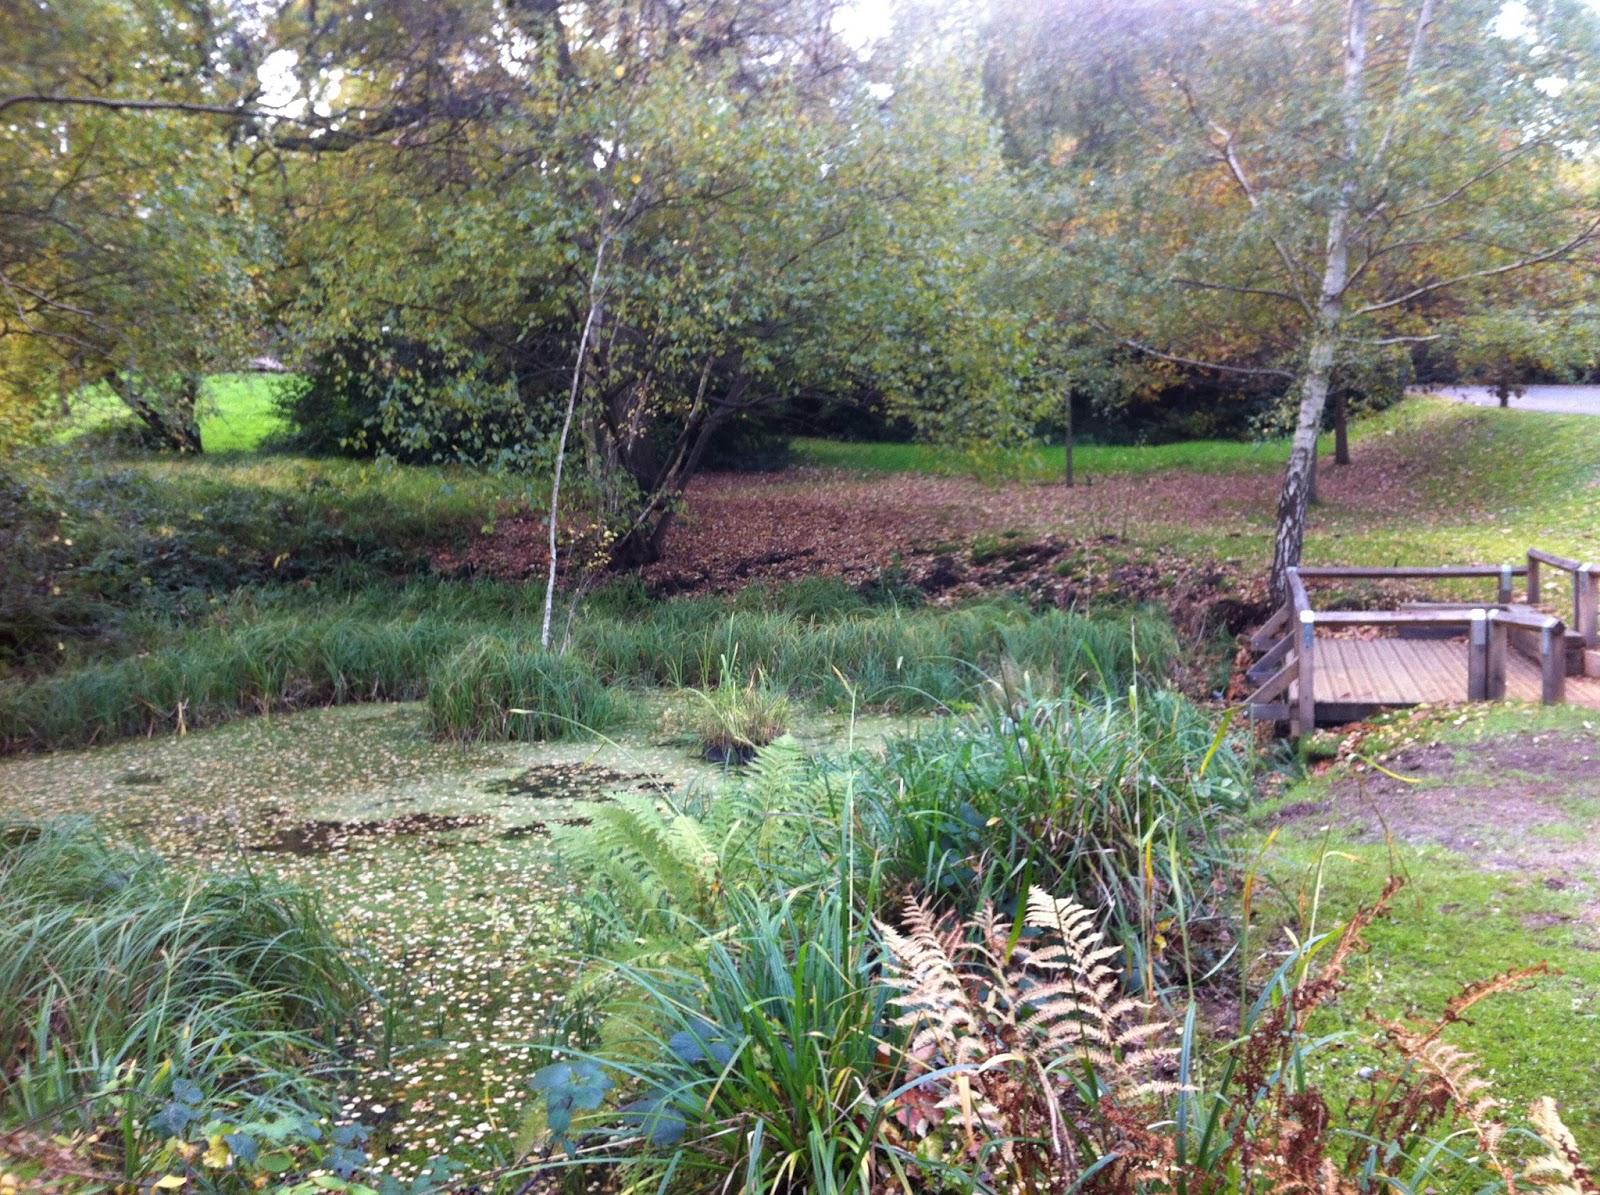 Kingston university biodiversity action group 16 11 2013 for Pond maintenance